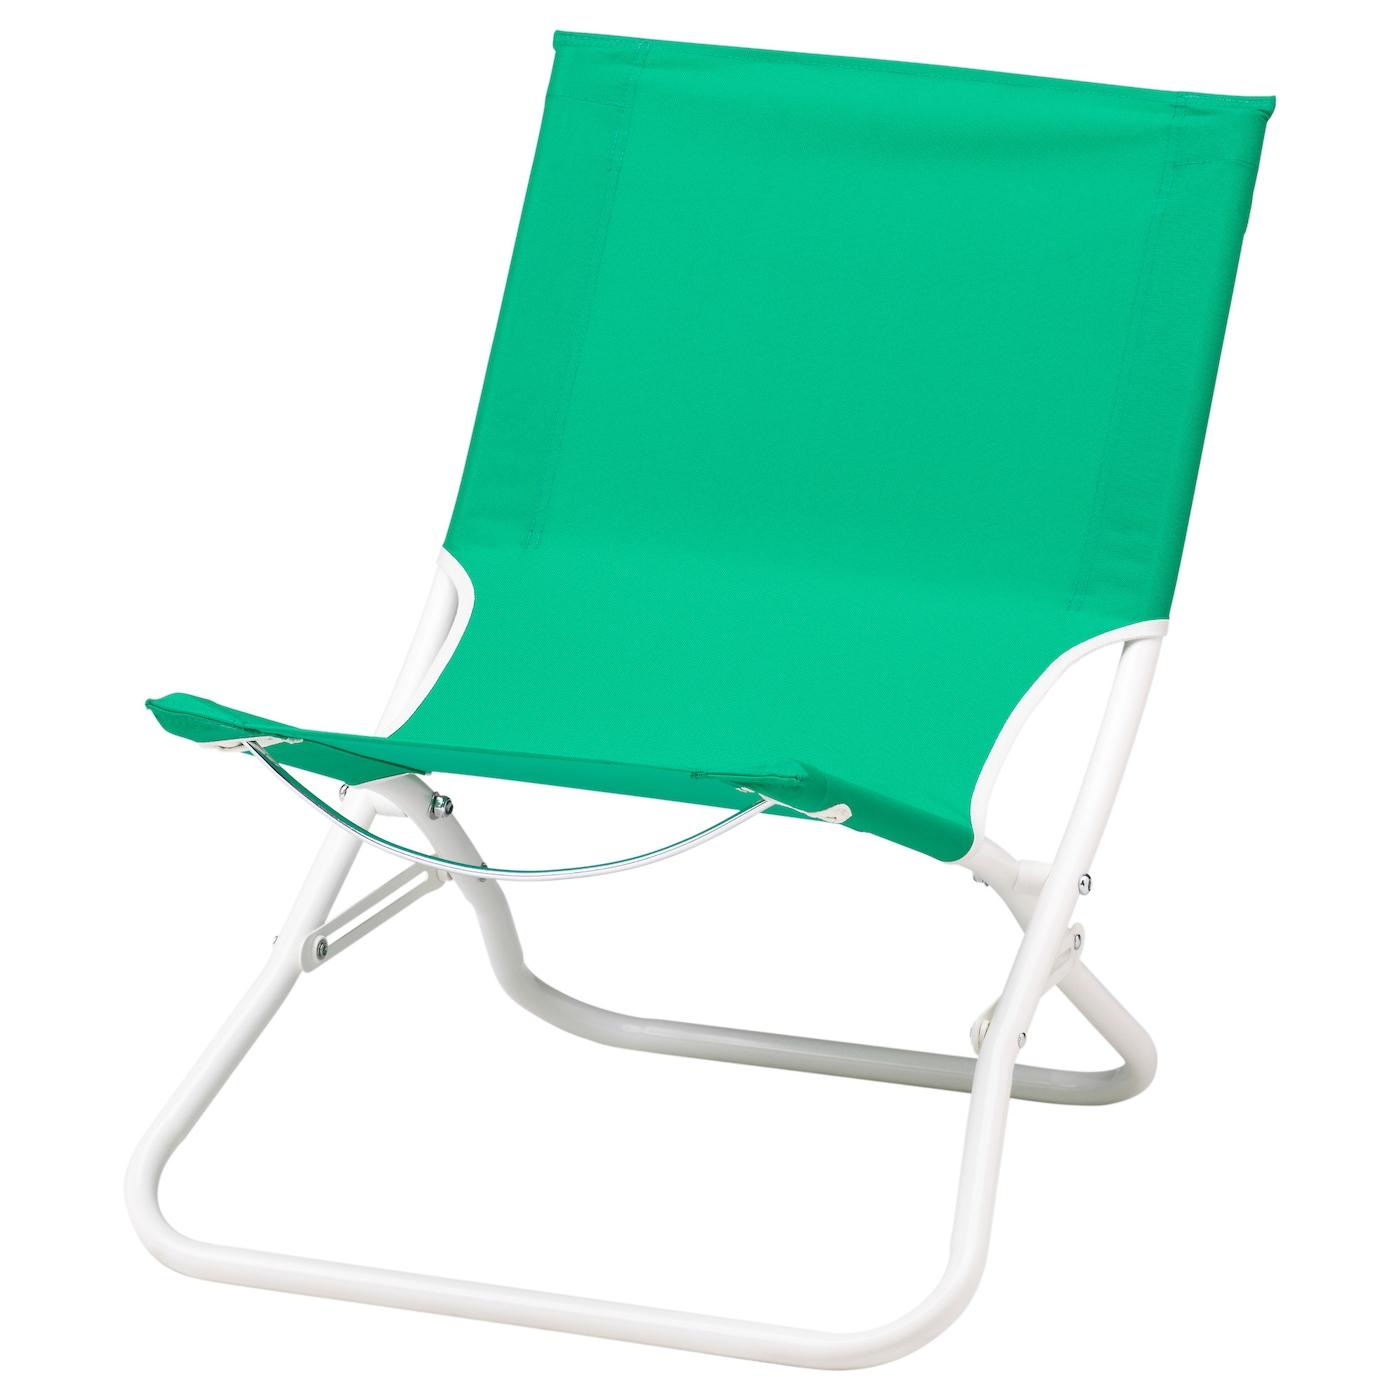 Outdoor & Garden Seating